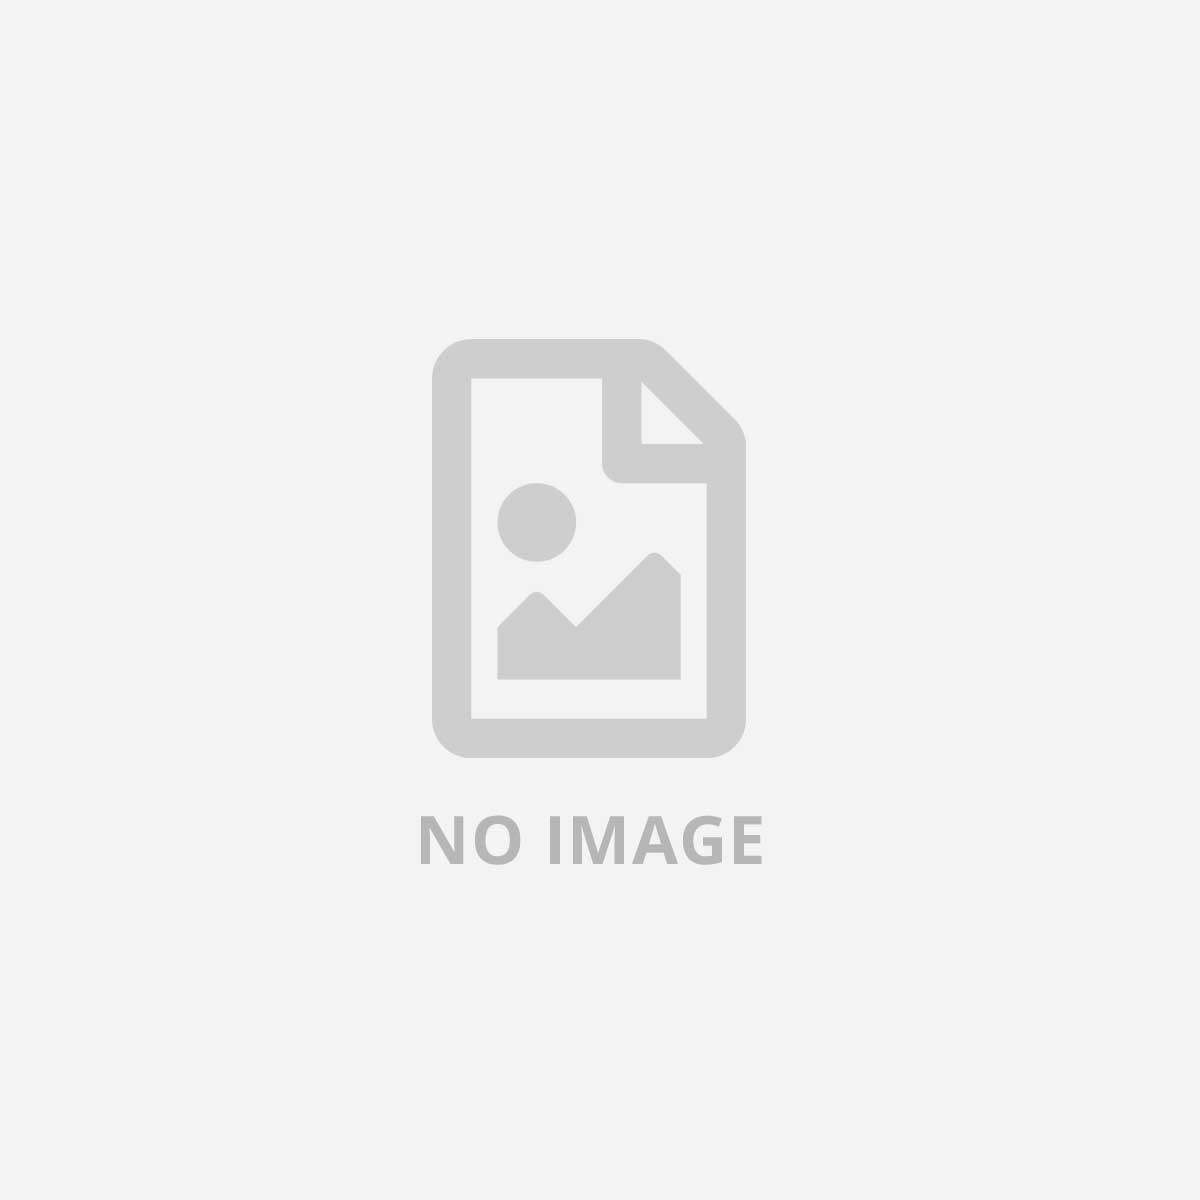 WATCHGUARD FIREBOX T20-W MSSP AP